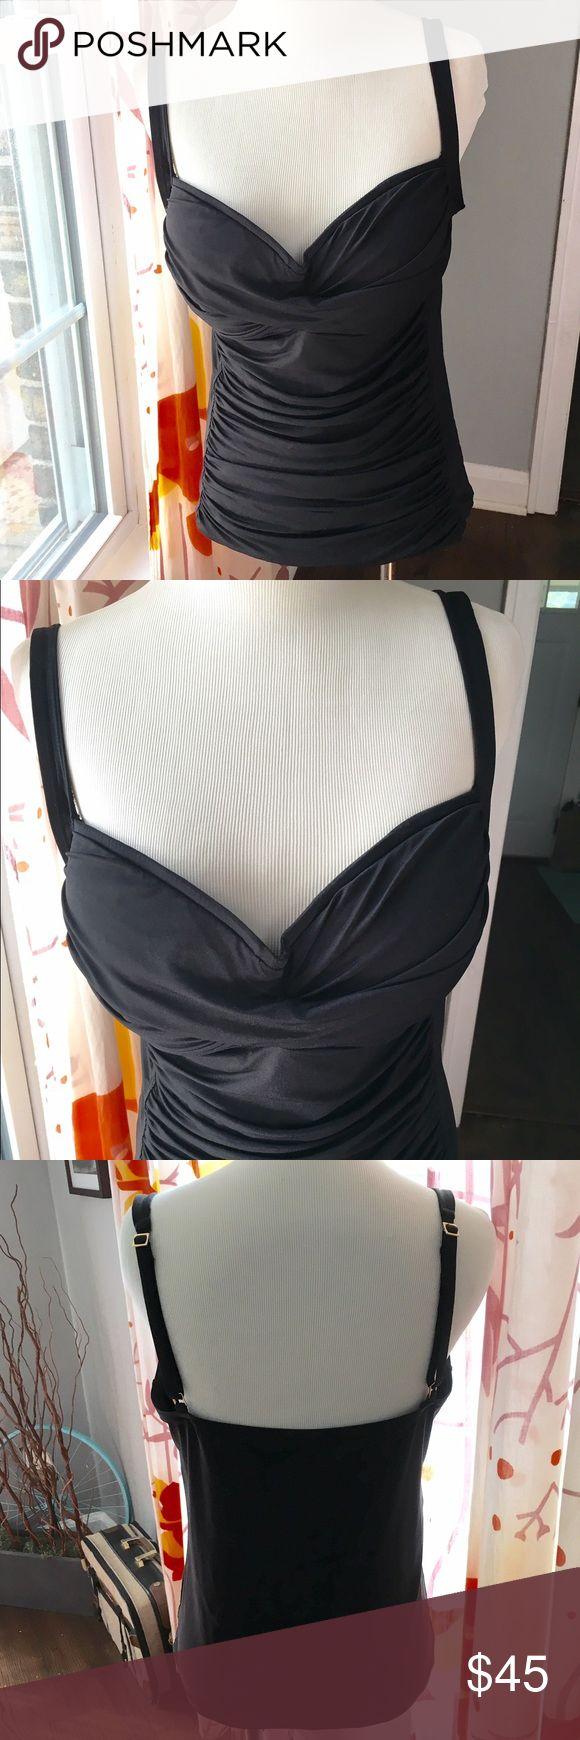 La Blanca slimming tankini, size 14, black La Blanca slimming tankini, size 14, black m, top only, beautiful. Great condition, adjustable straps. Purchased at Nordstroms La Blanca Swim